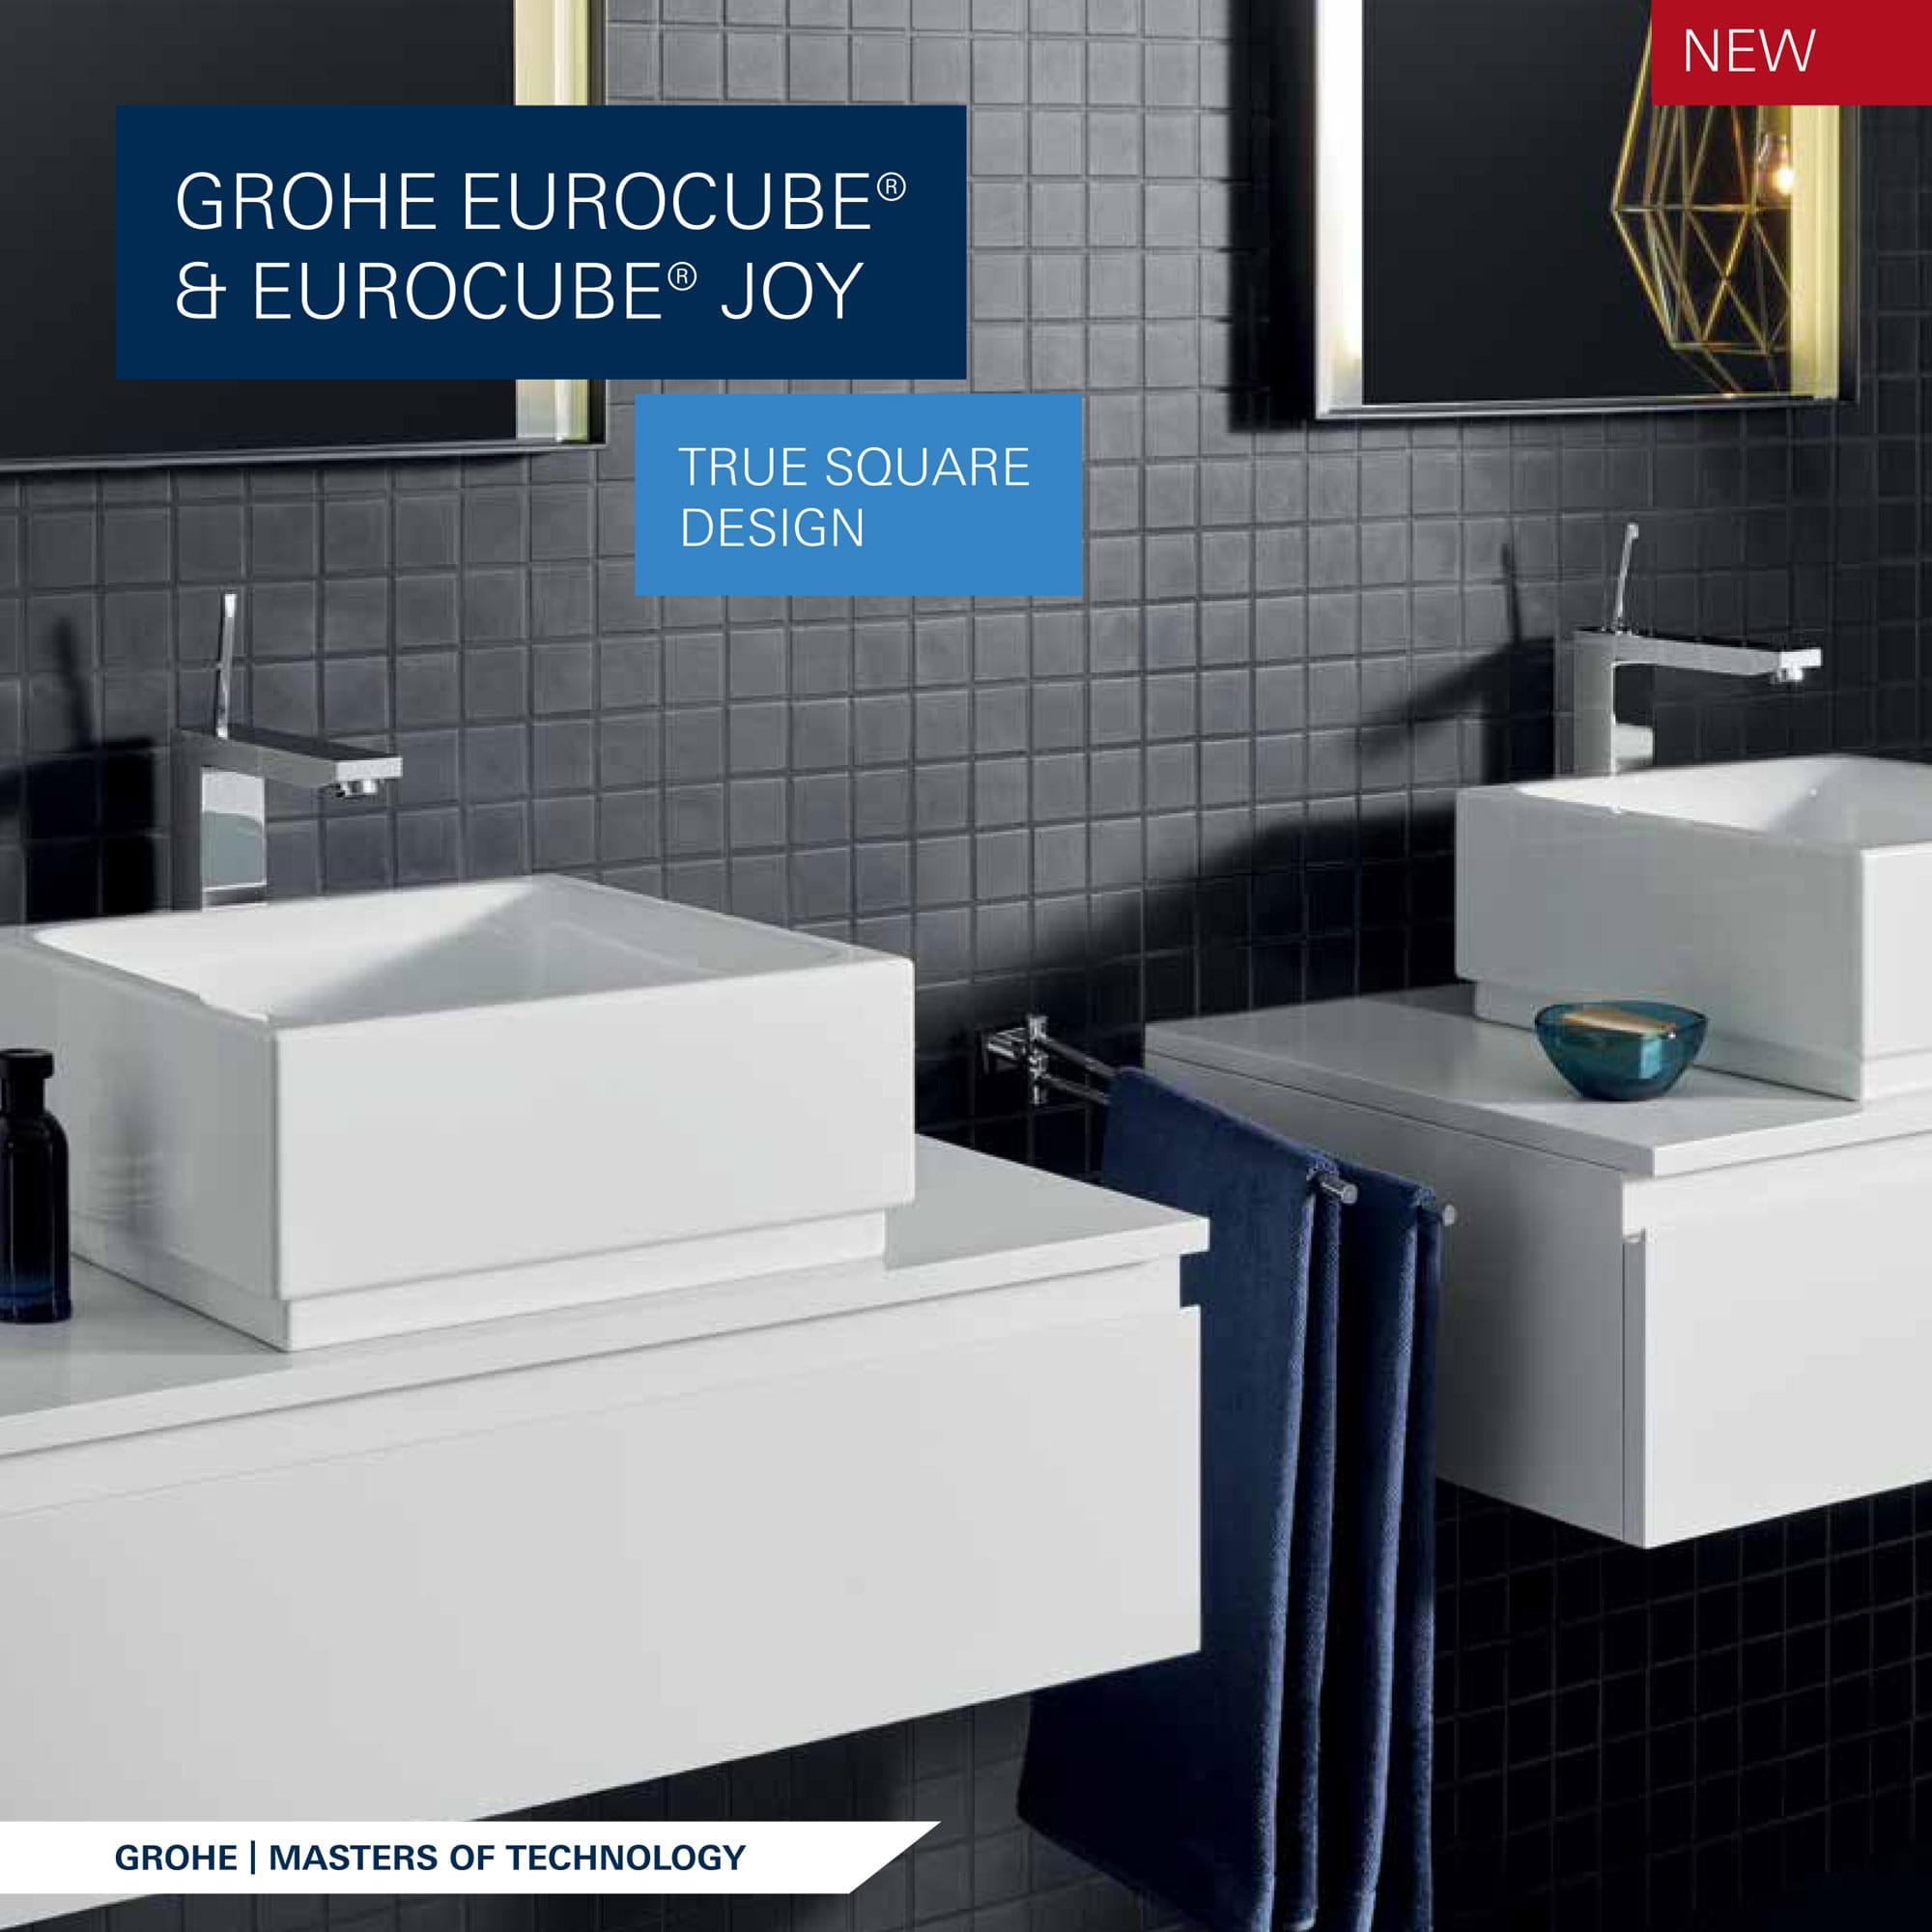 white sinks side by side